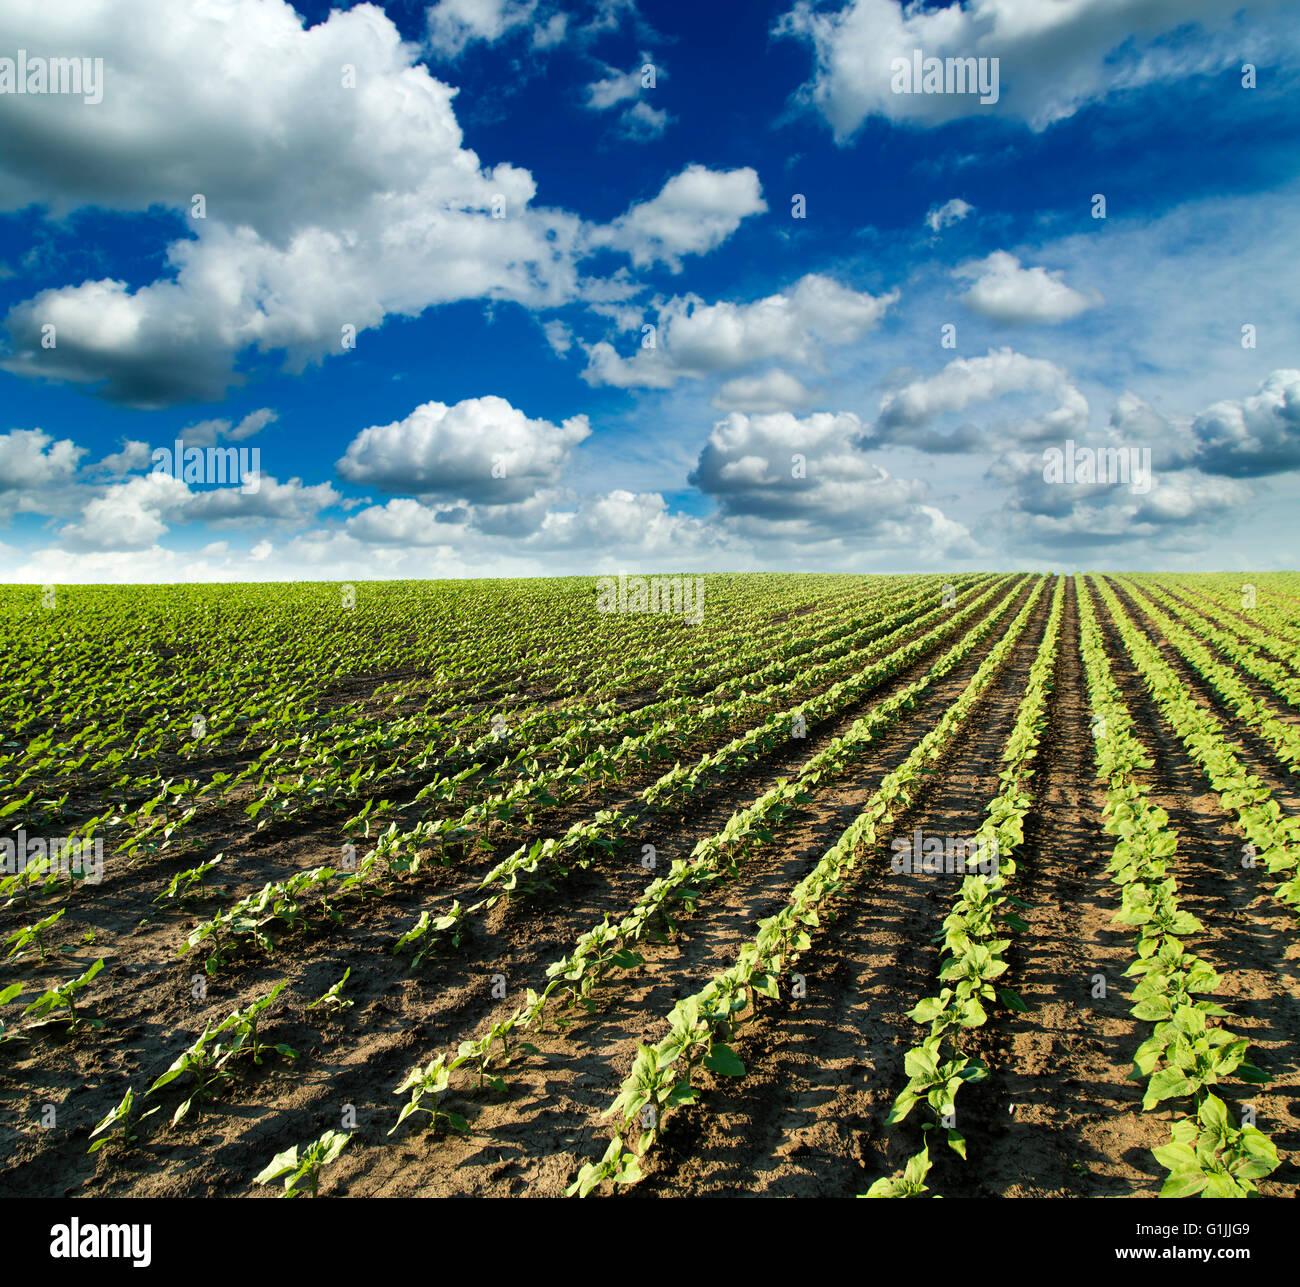 Green sunflower field maturing - Stock Image